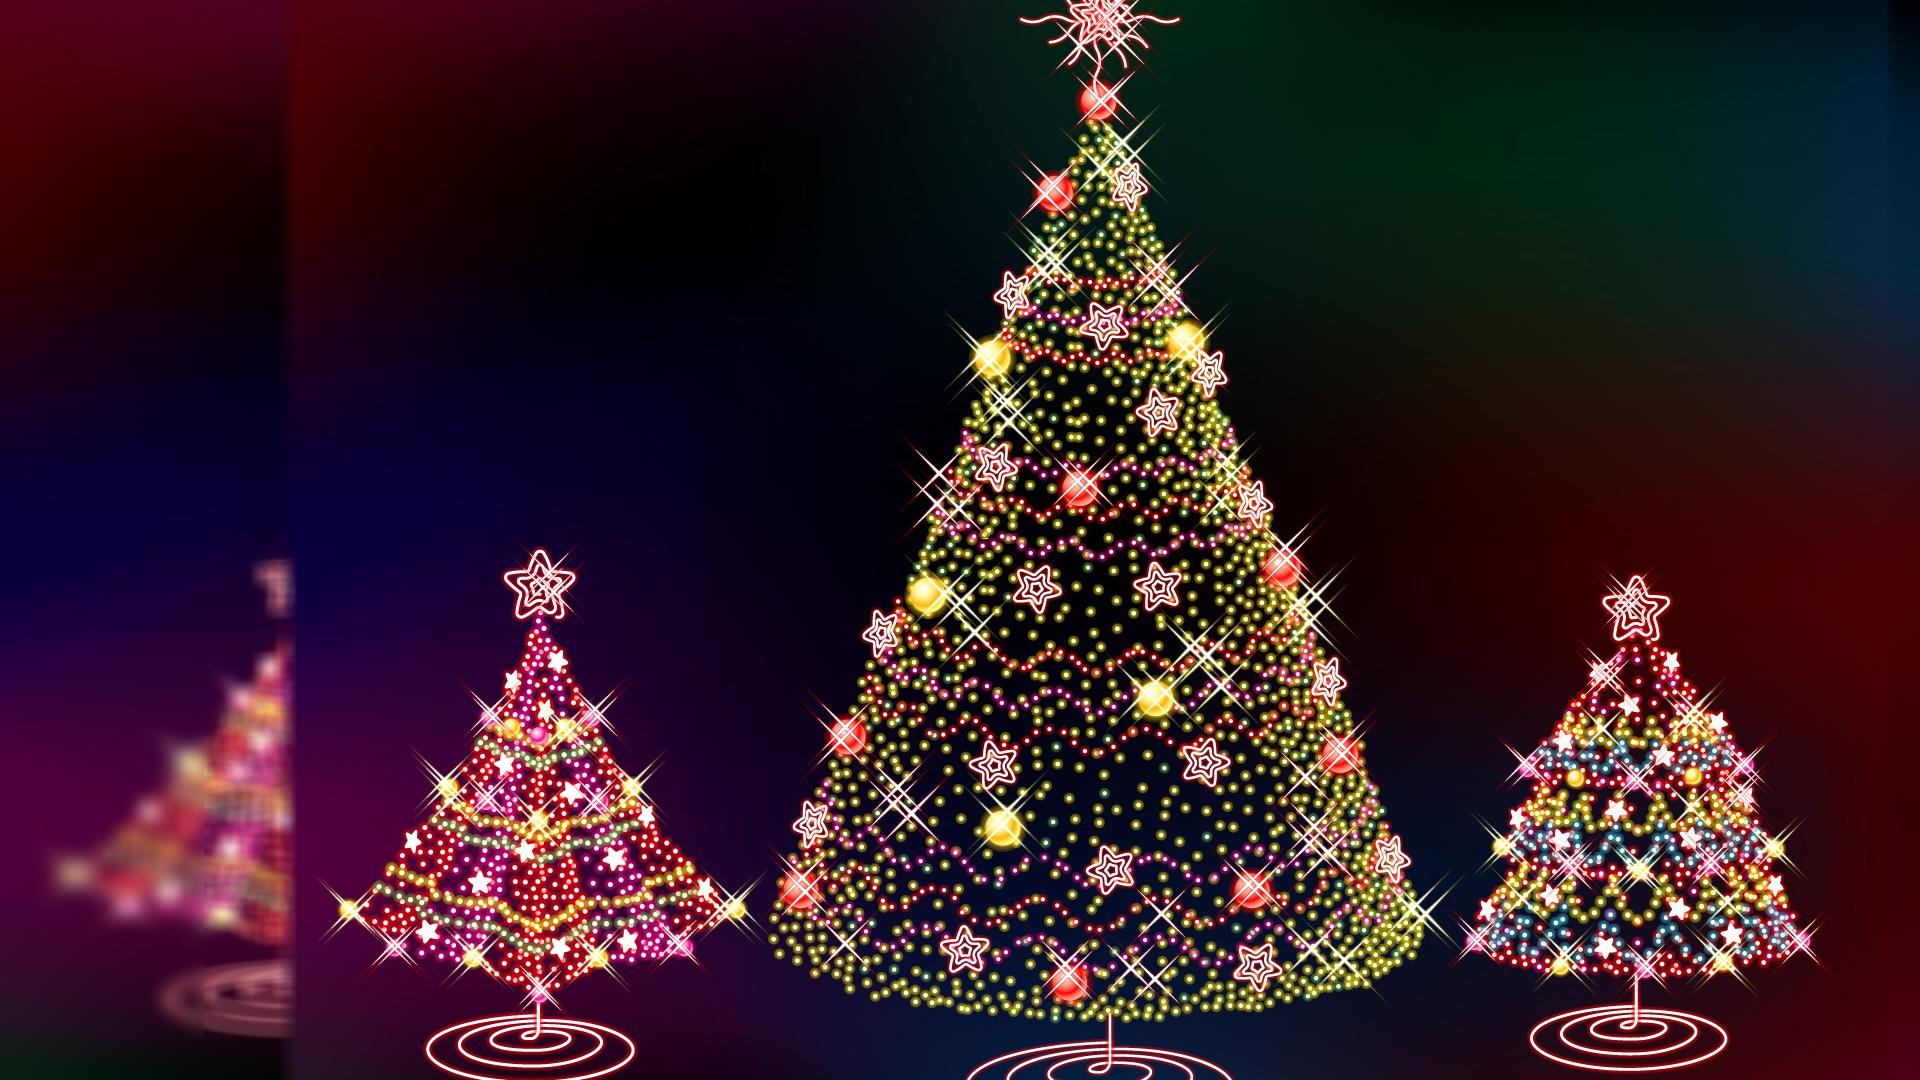 free christmas desktop wallpaper c lyybj 1920x1080 - Christmas Desktop Background